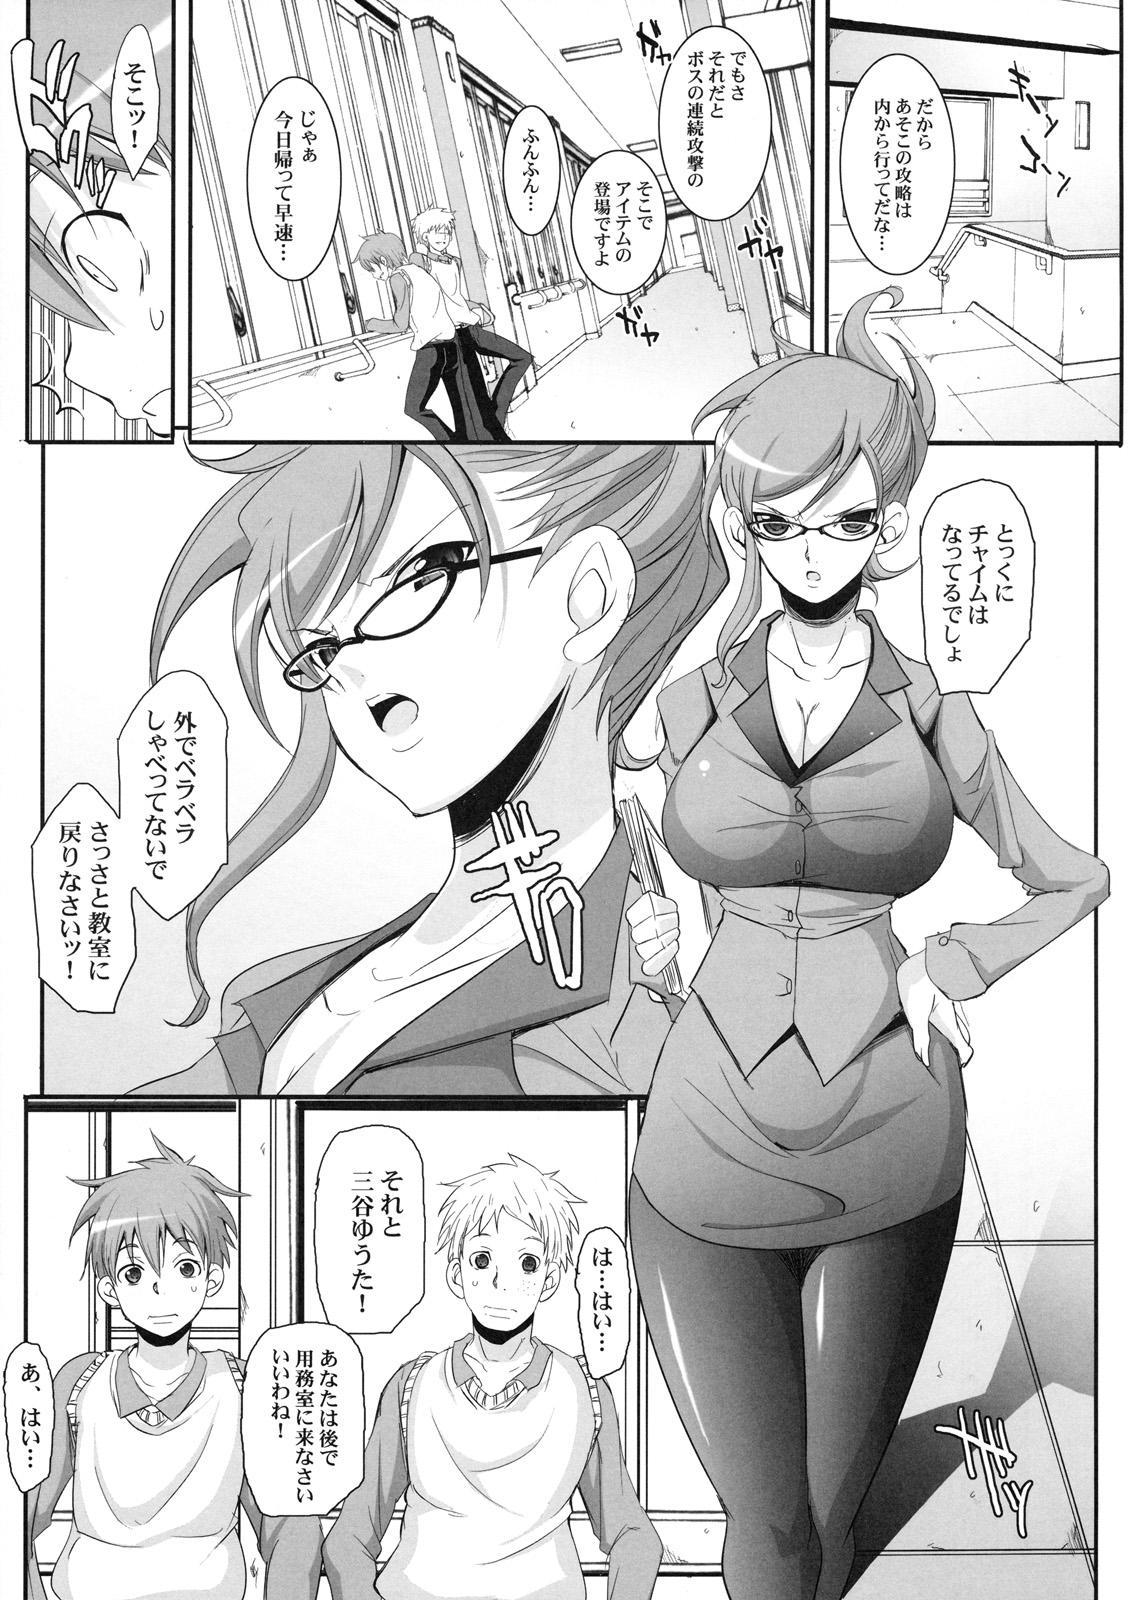 Shinzui Valentine Special Vol. 1 63